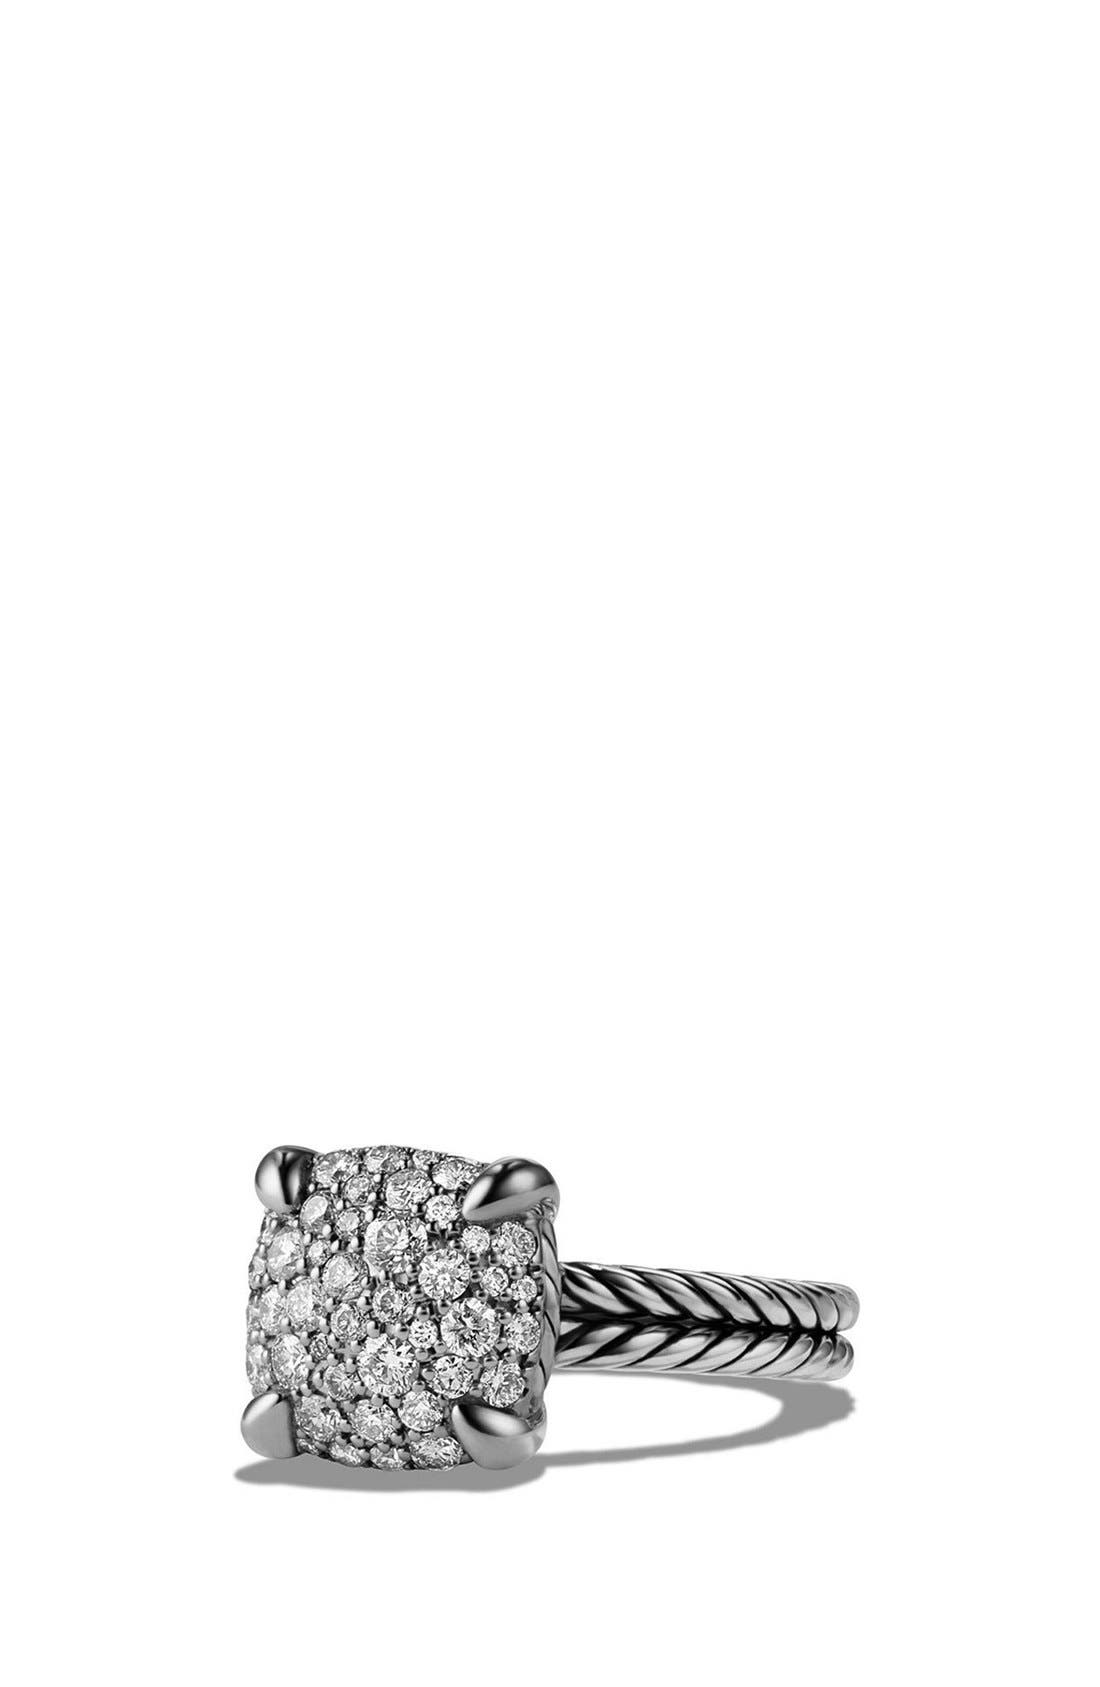 David Yurman 'Châtelaine' Ring with Diamonds